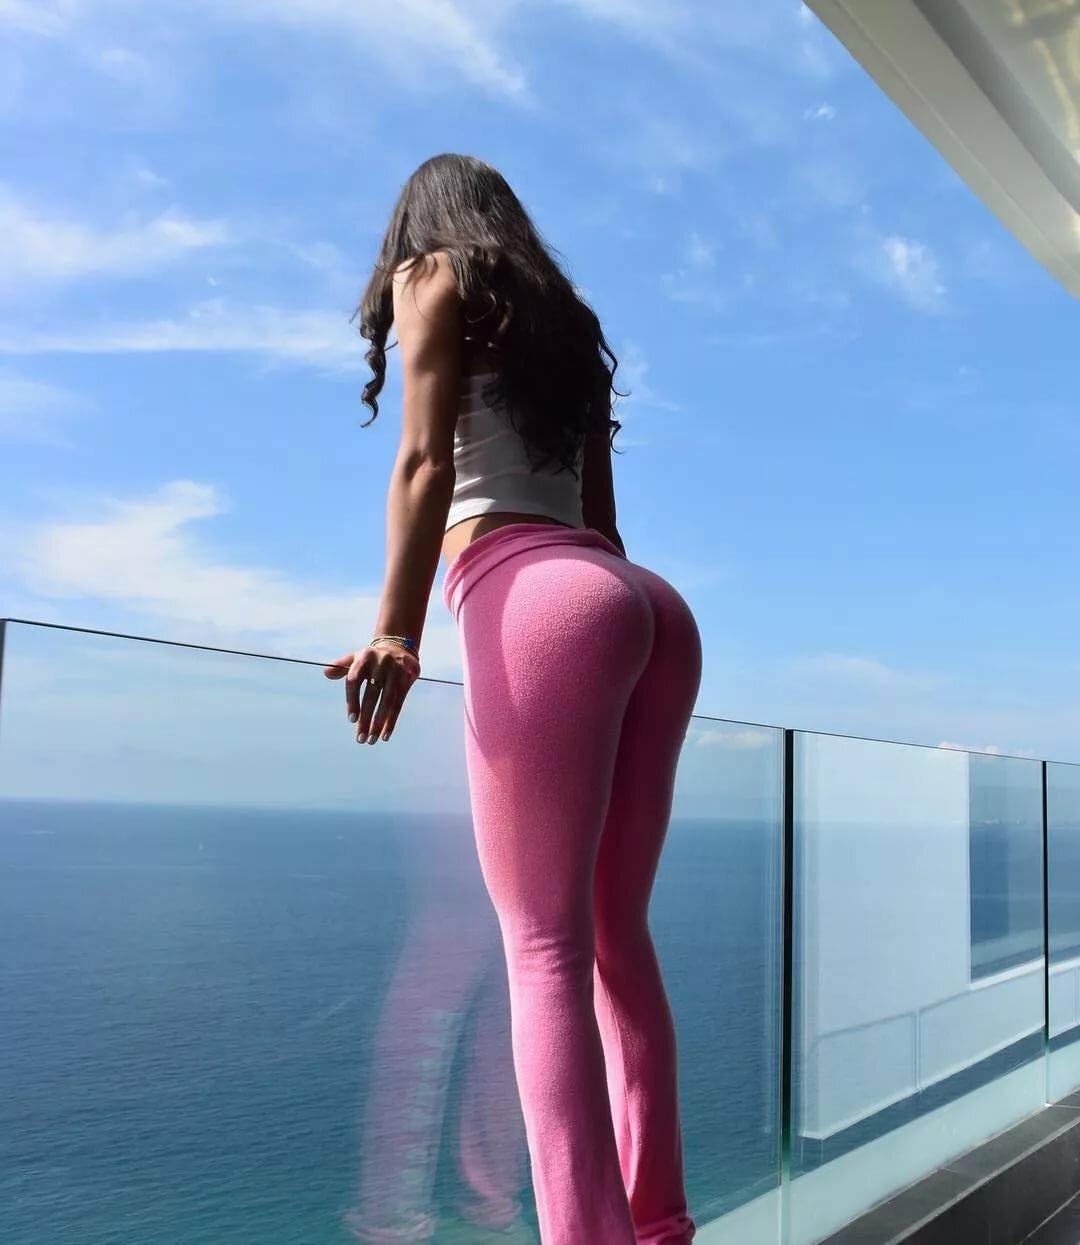 Babe in yoga pants bikini pics, skinny girls pussy swollen